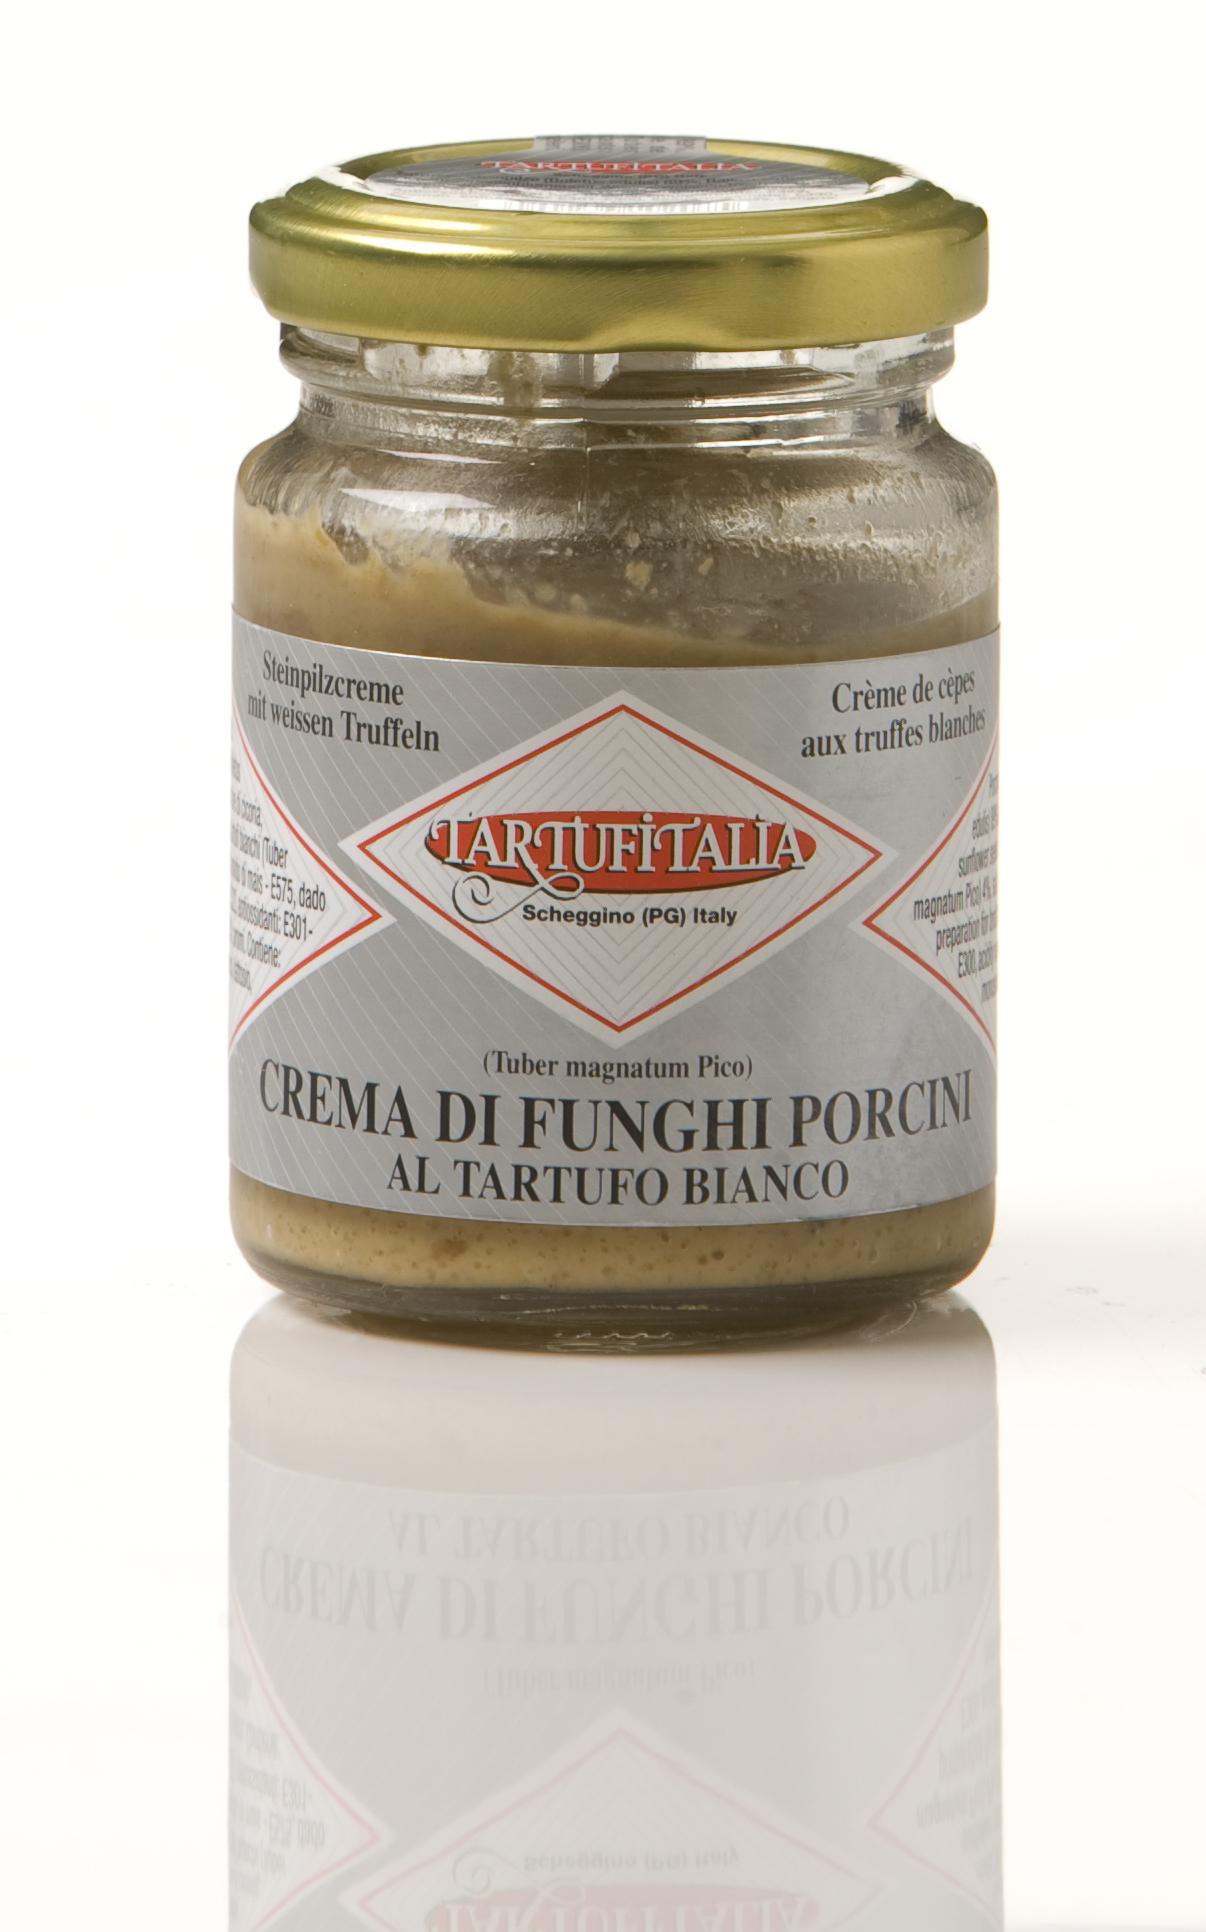 Crema di funghi porcini al tartufo bianco 80 g Glas Tartufitalia Steinpilzcreme mit weißem Trüffel